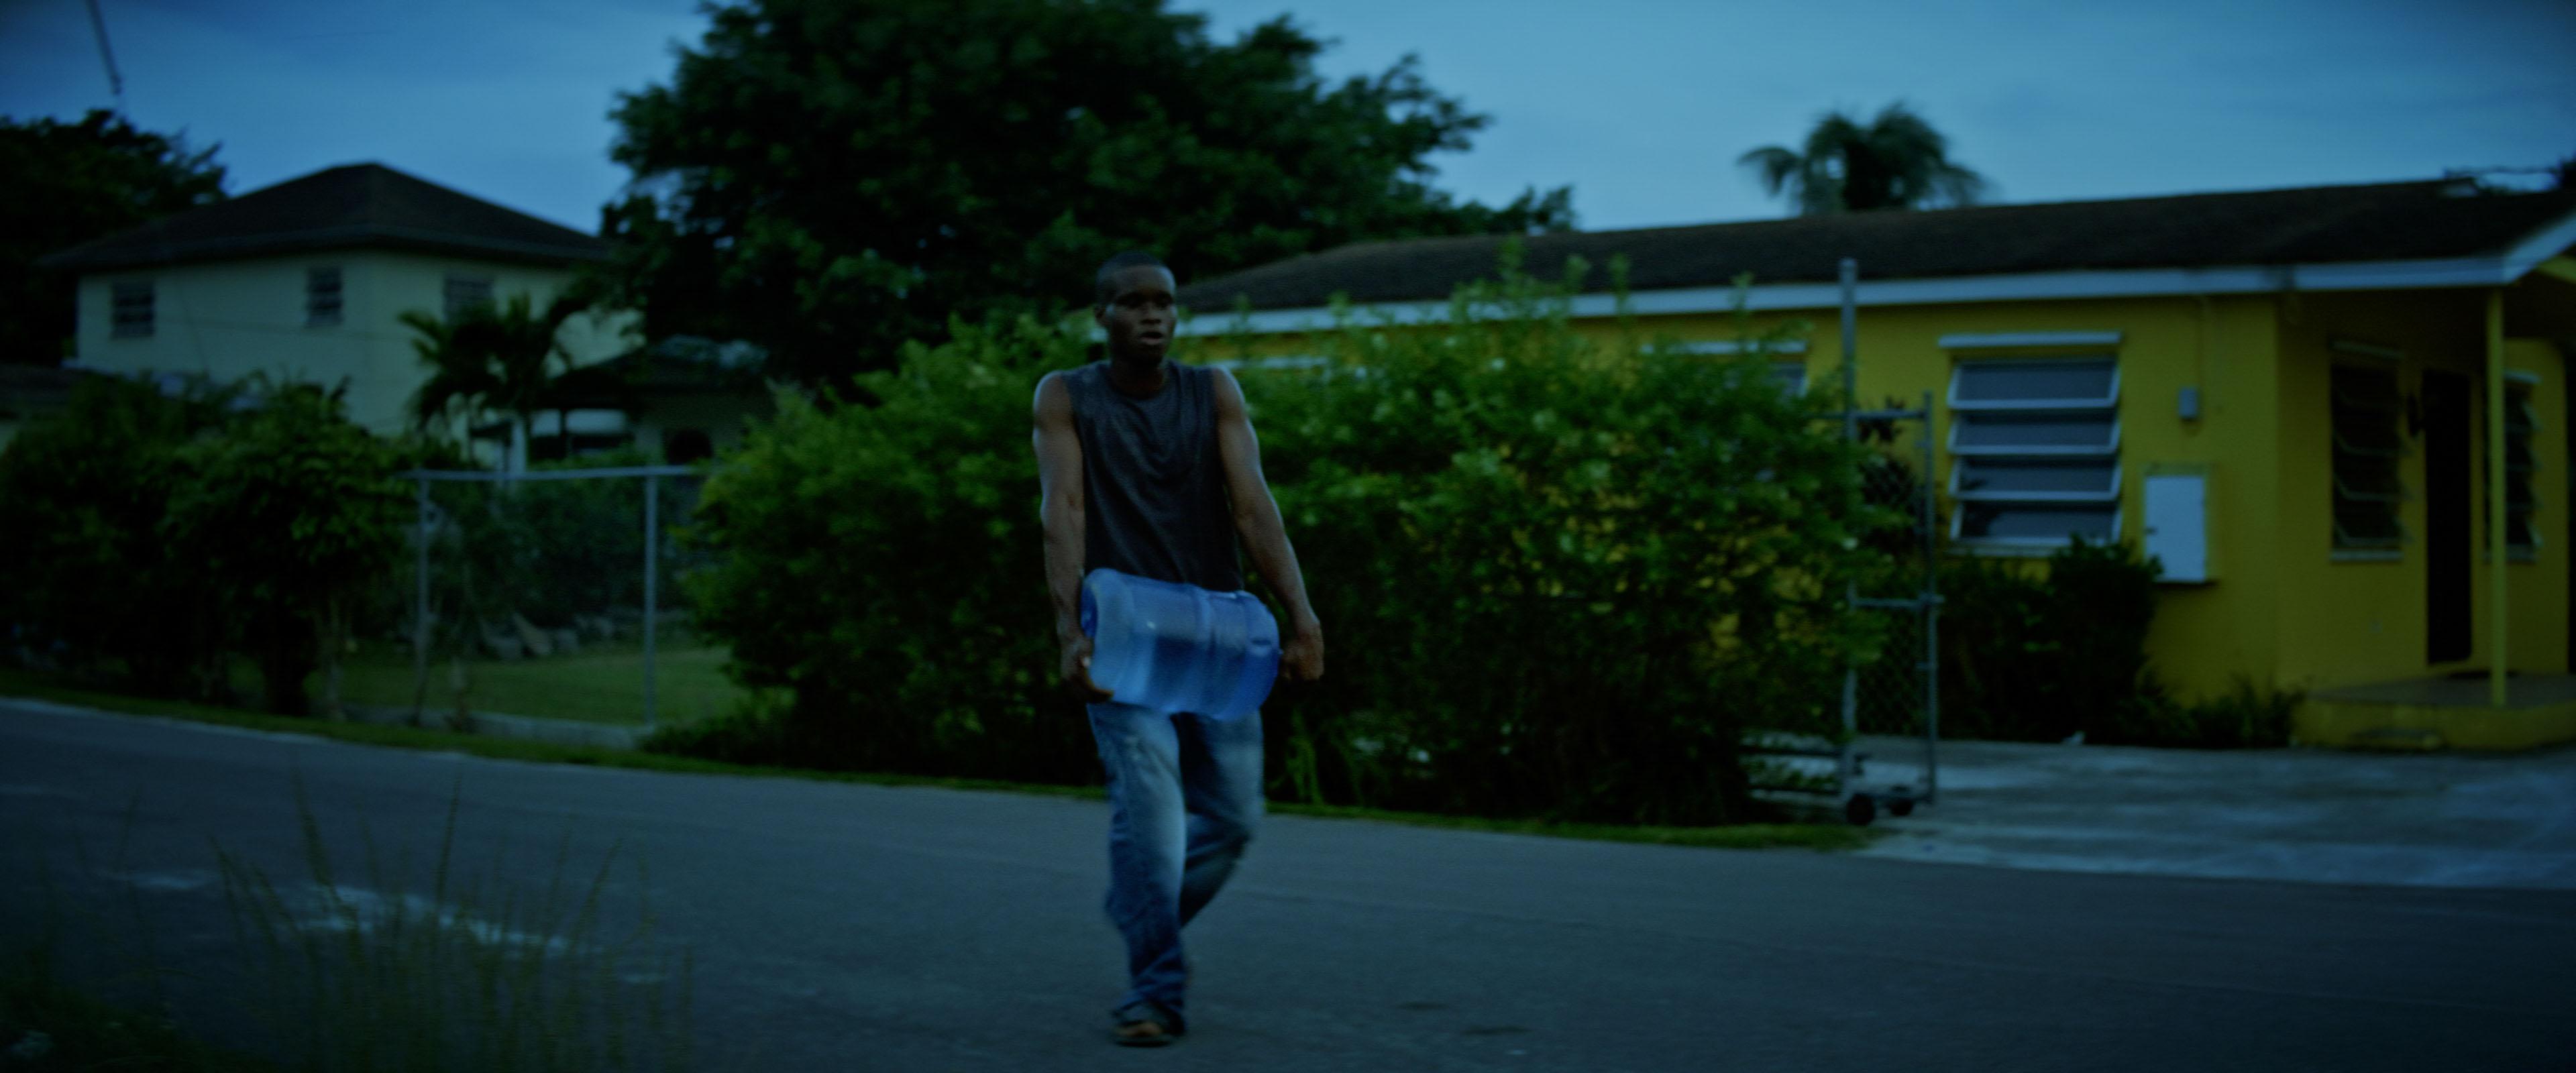 Race Against Time - Short Film (My Rode Reel 2020) #Myrodereel2020